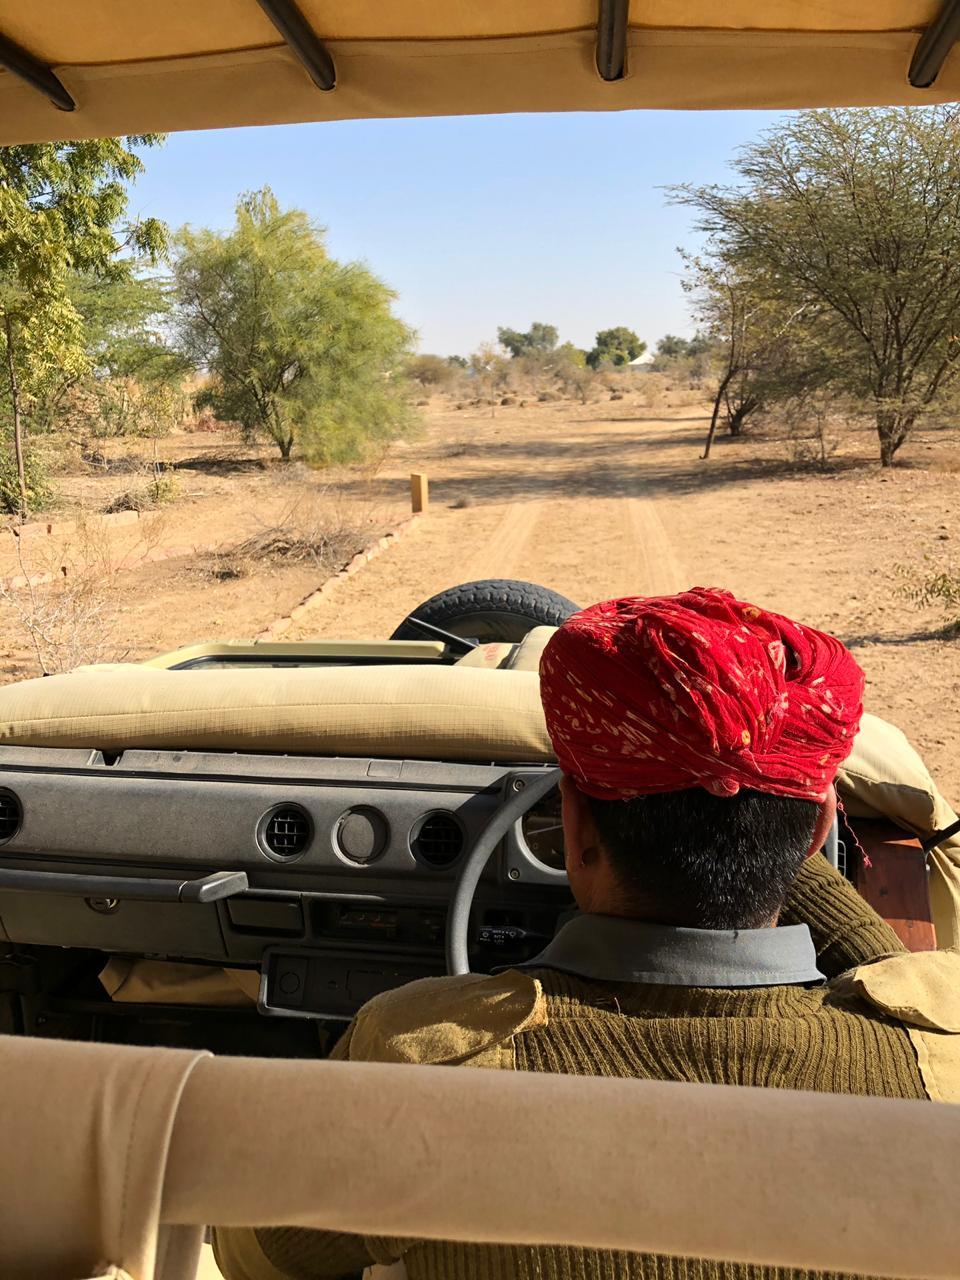 Dessert ride at Serai, serai sujan jaisalmer, sujan the serai jaisalmer, the serai jaisalmer, The Serai Sujan,